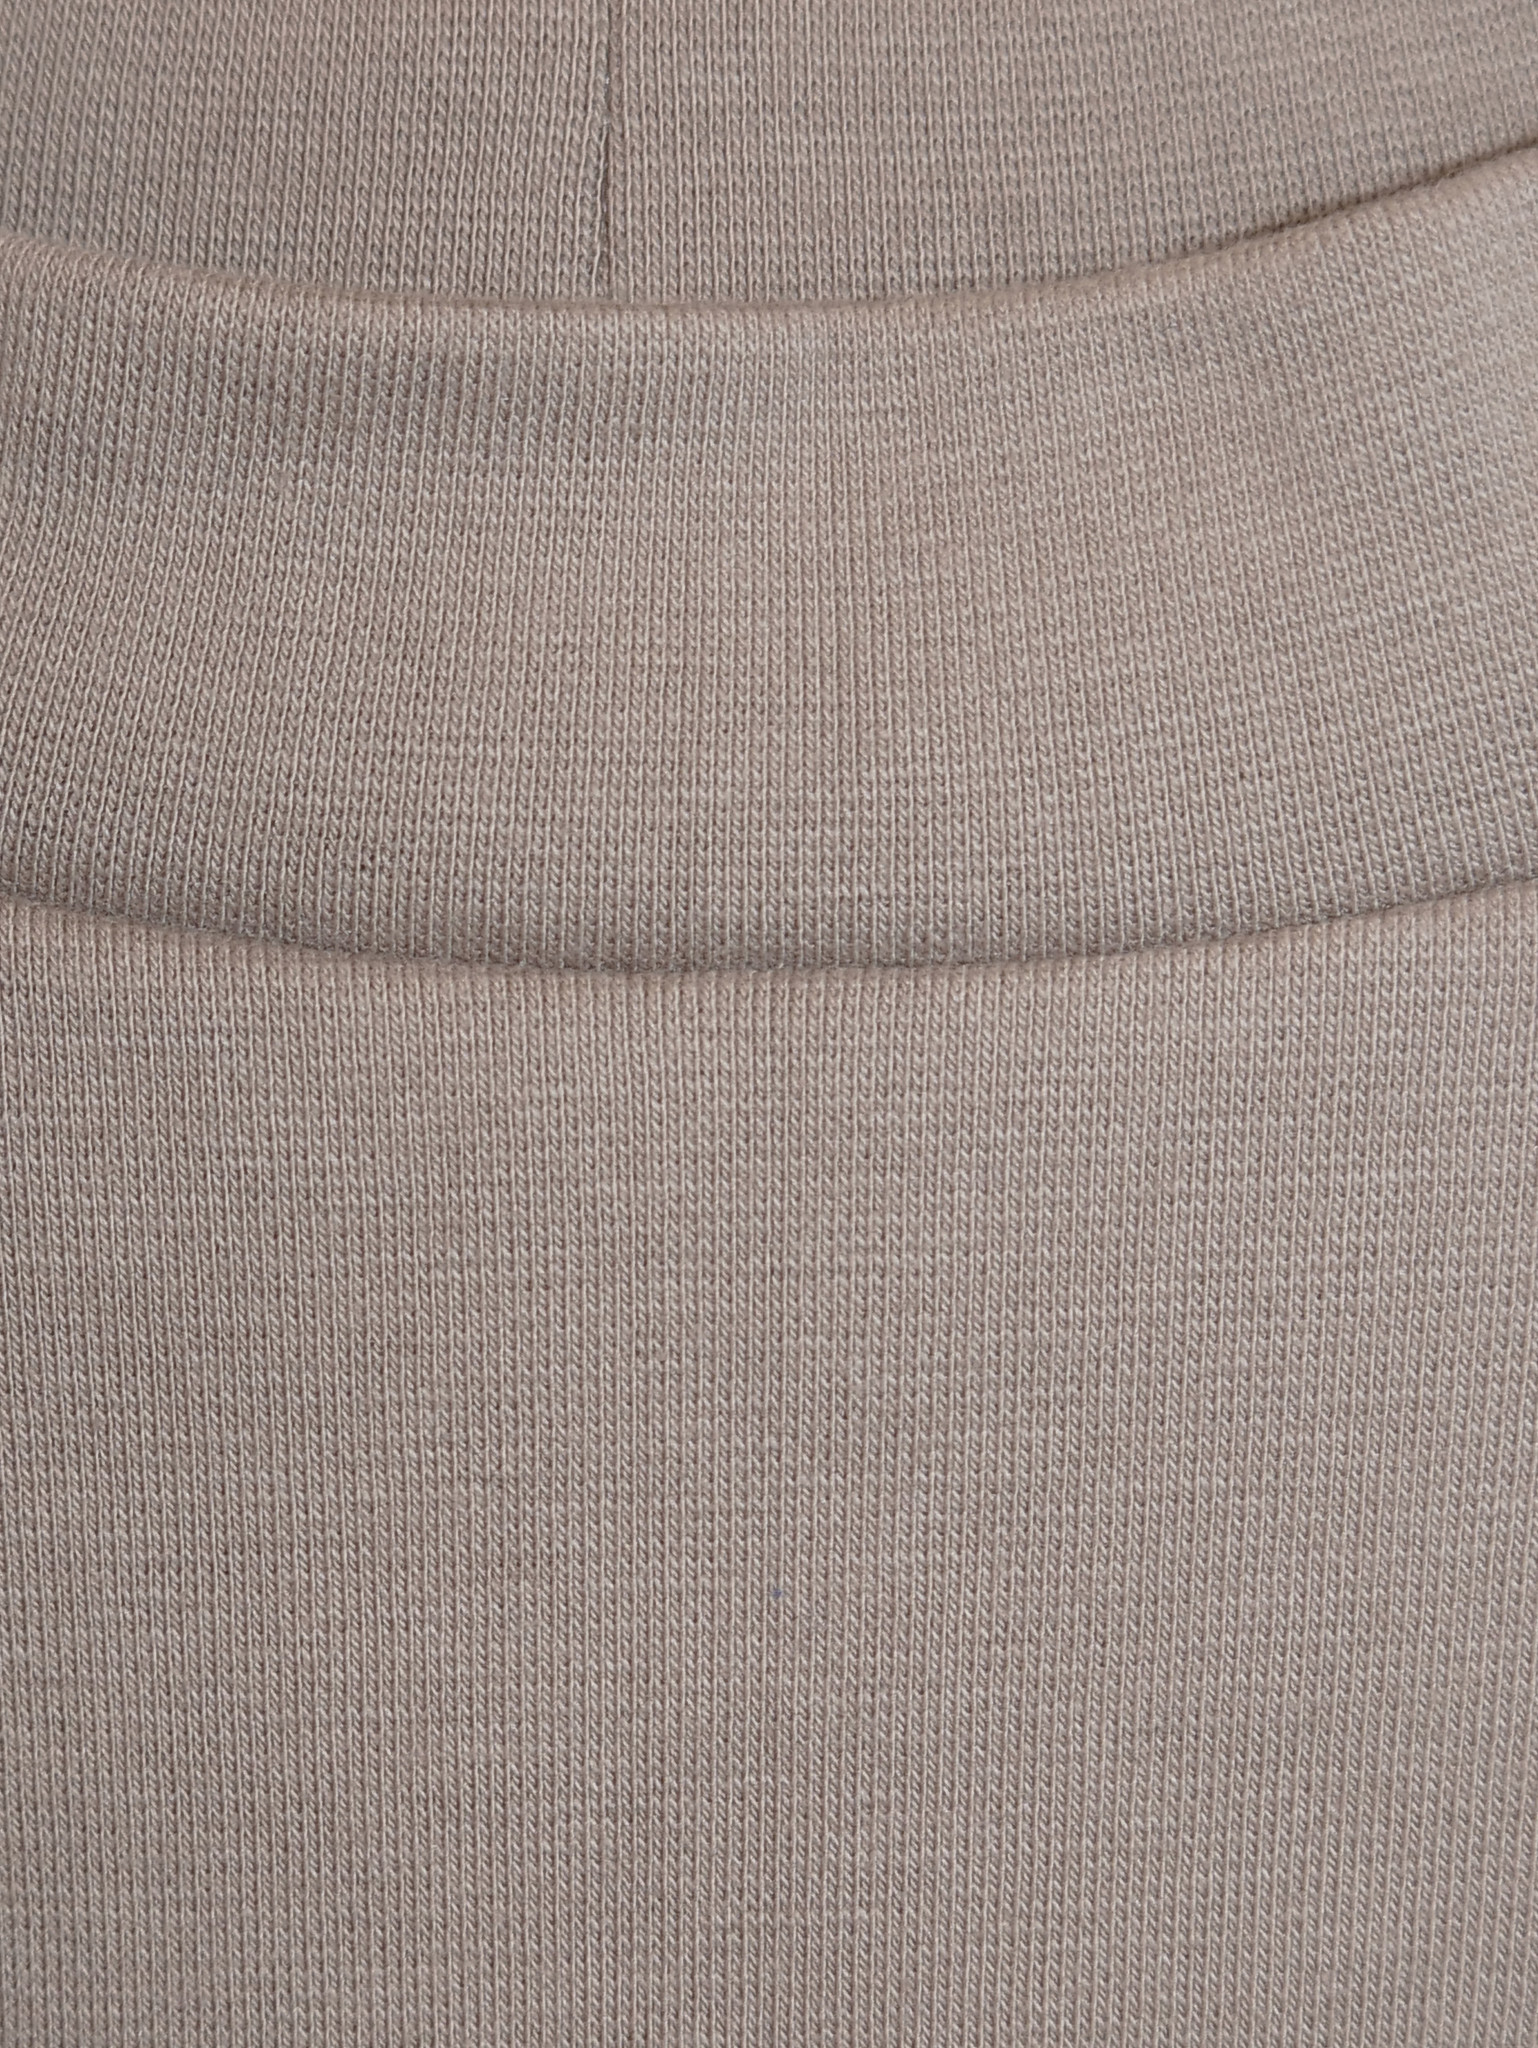 Slim cotton skirt - taupe-4